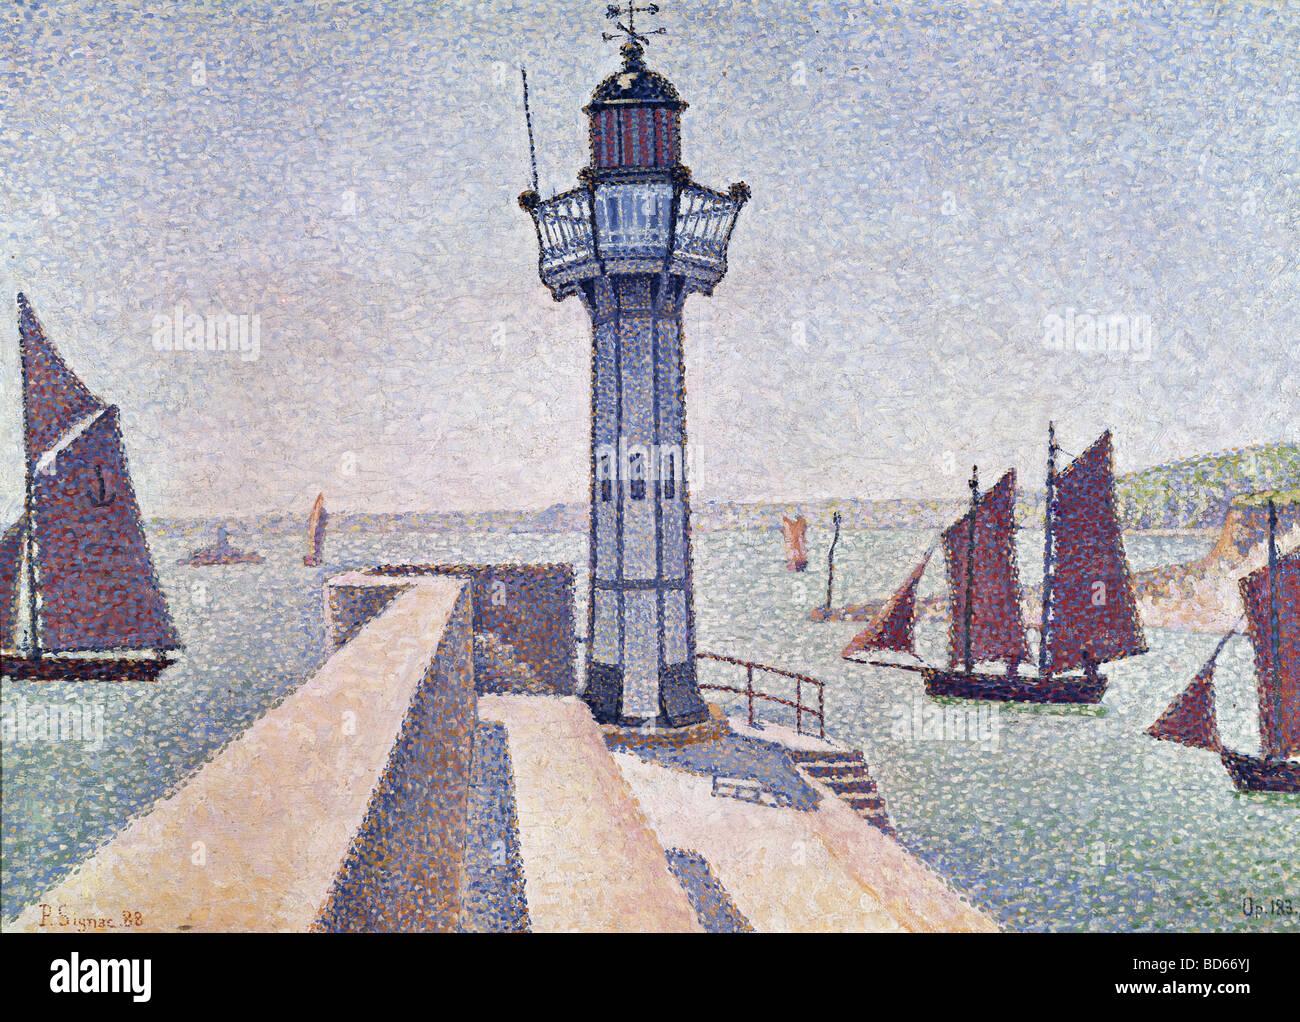 Bellas artes, Signac, Paul (1863 - 1935), pintura, 'Portrieux, Le Phare' de 1888, Rijksmuseum Kröller Imagen De Stock